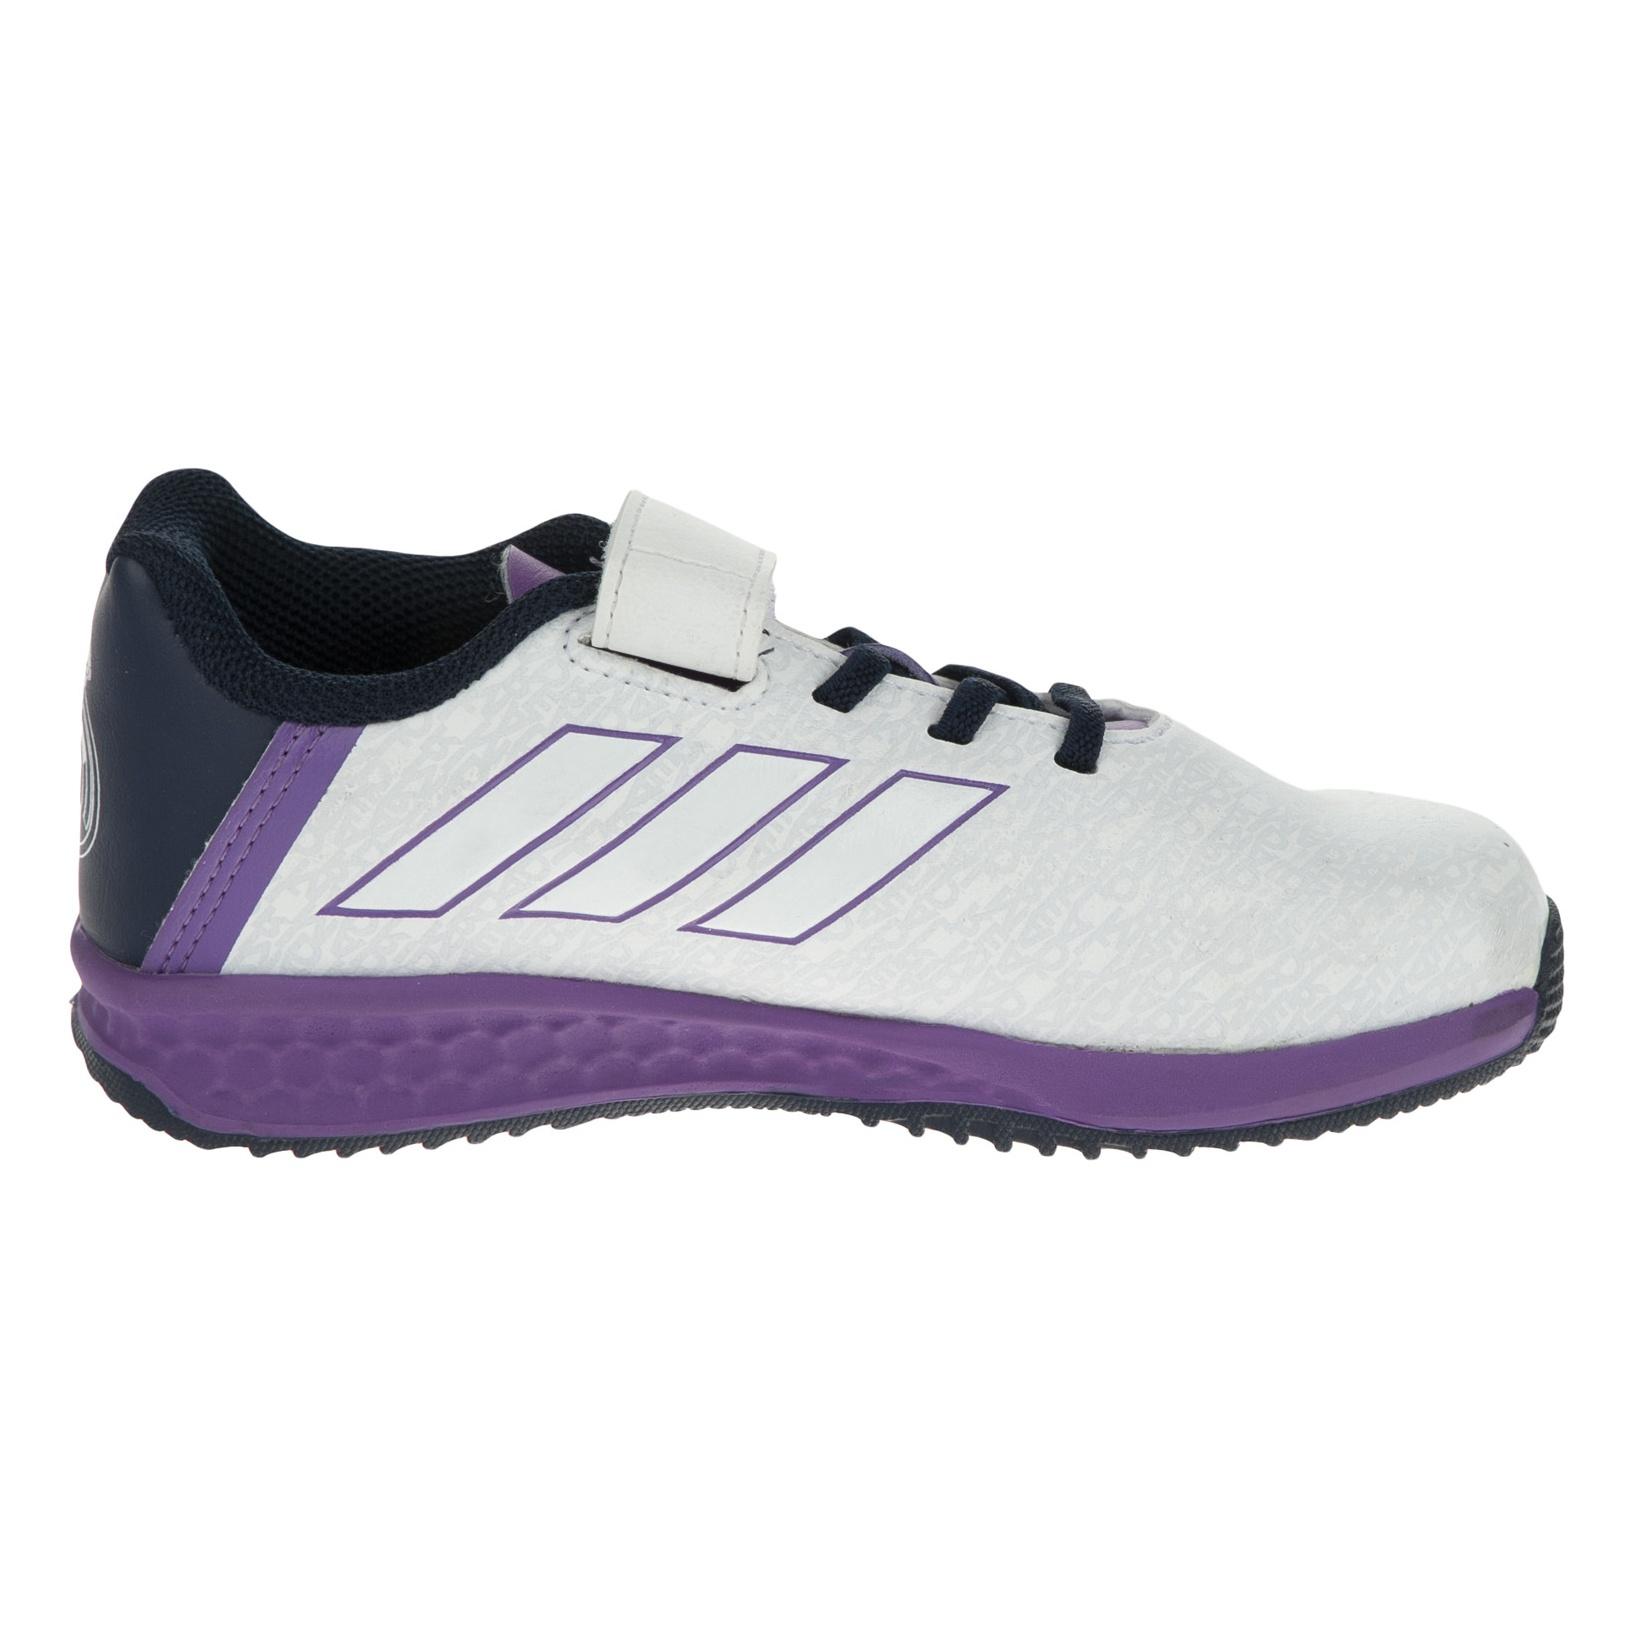 کفش مخصوص تمرین پسرانه آدیداس مدل RapidTurf REAL EL